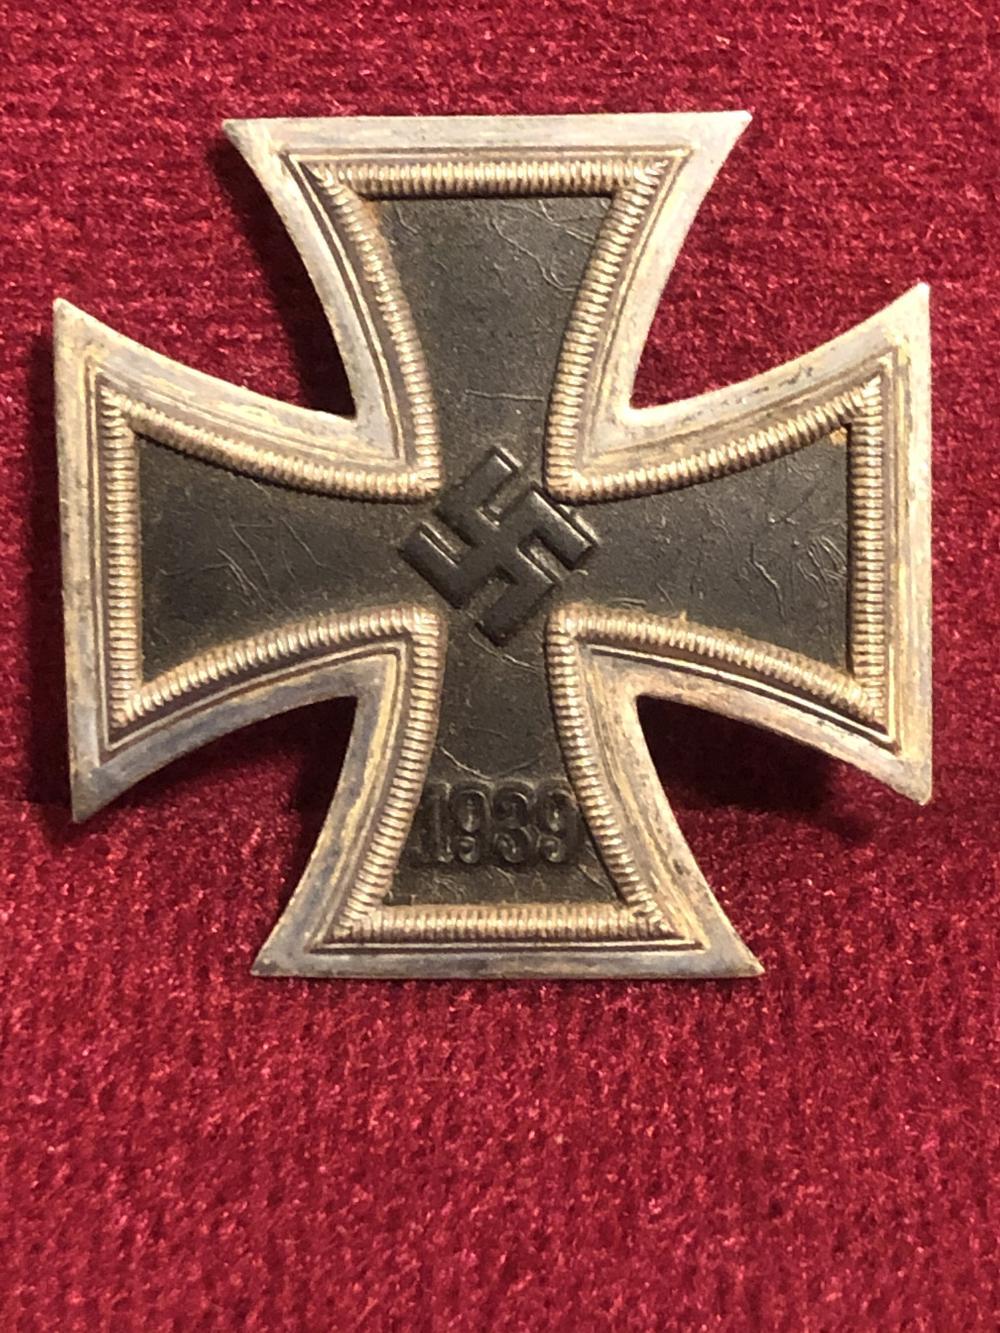 WWII German Nazi grand cross of the iron cross